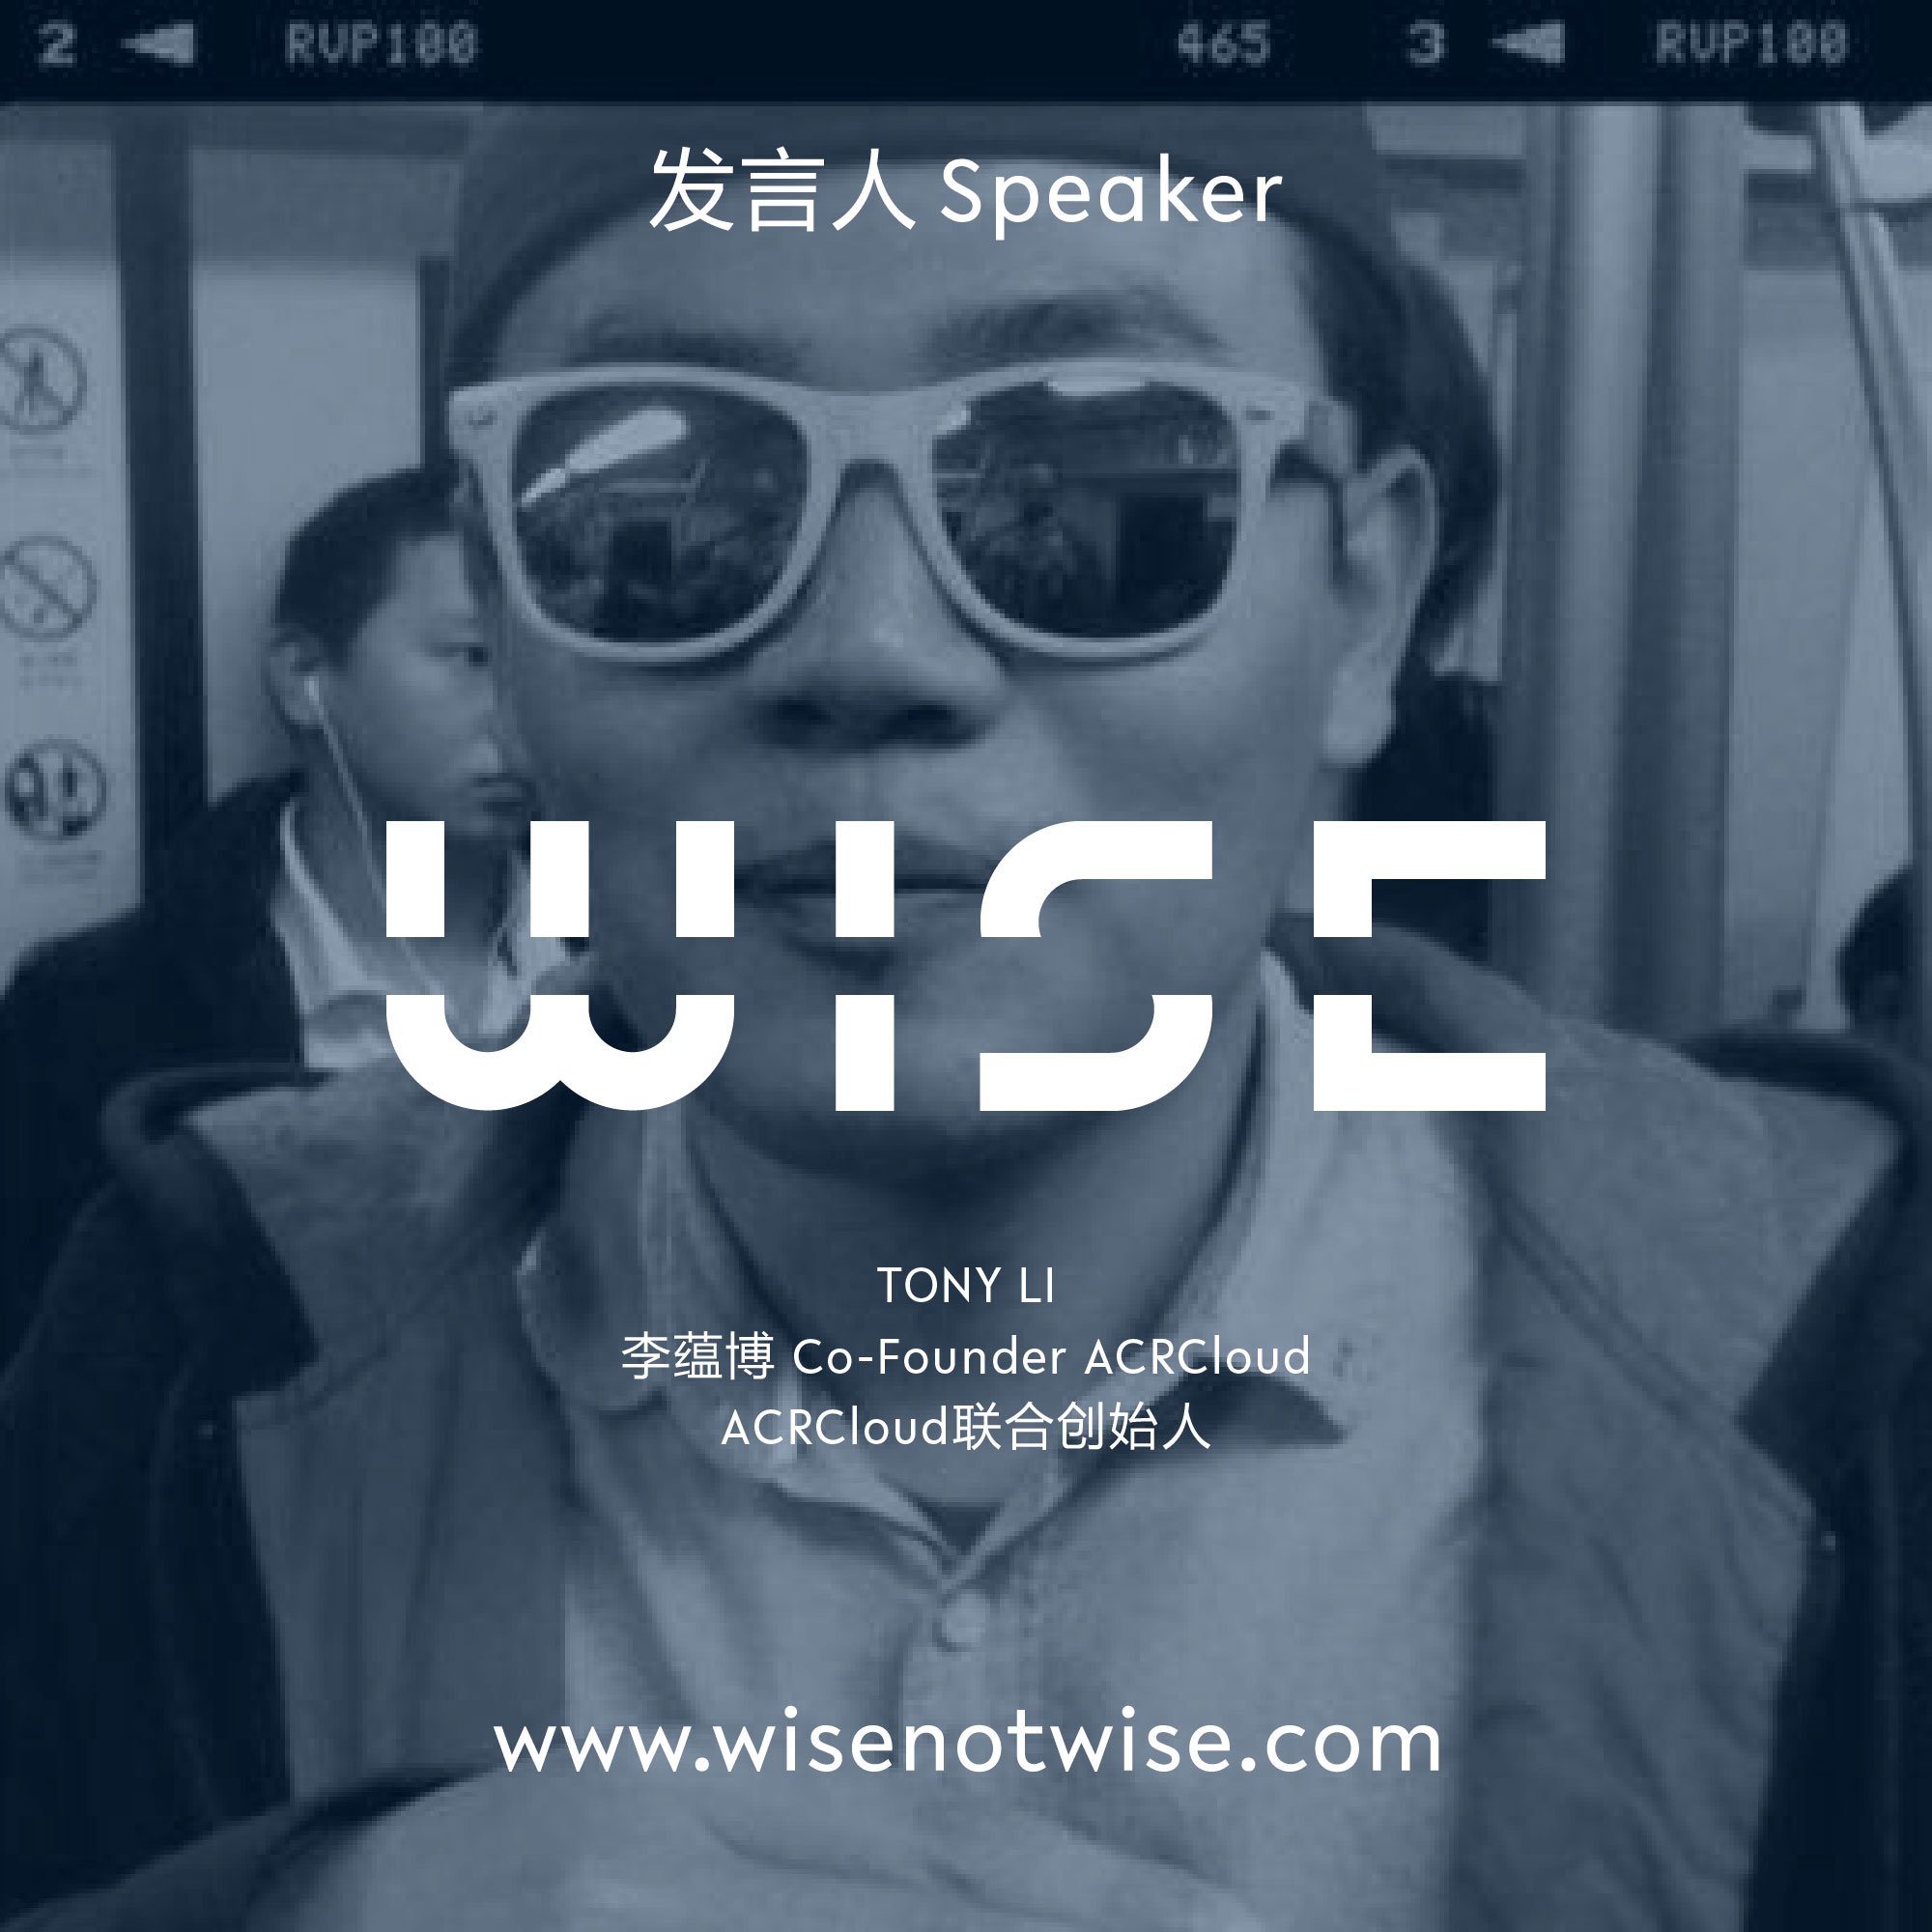 Tony Li (Co-Founder of ACRCloud)